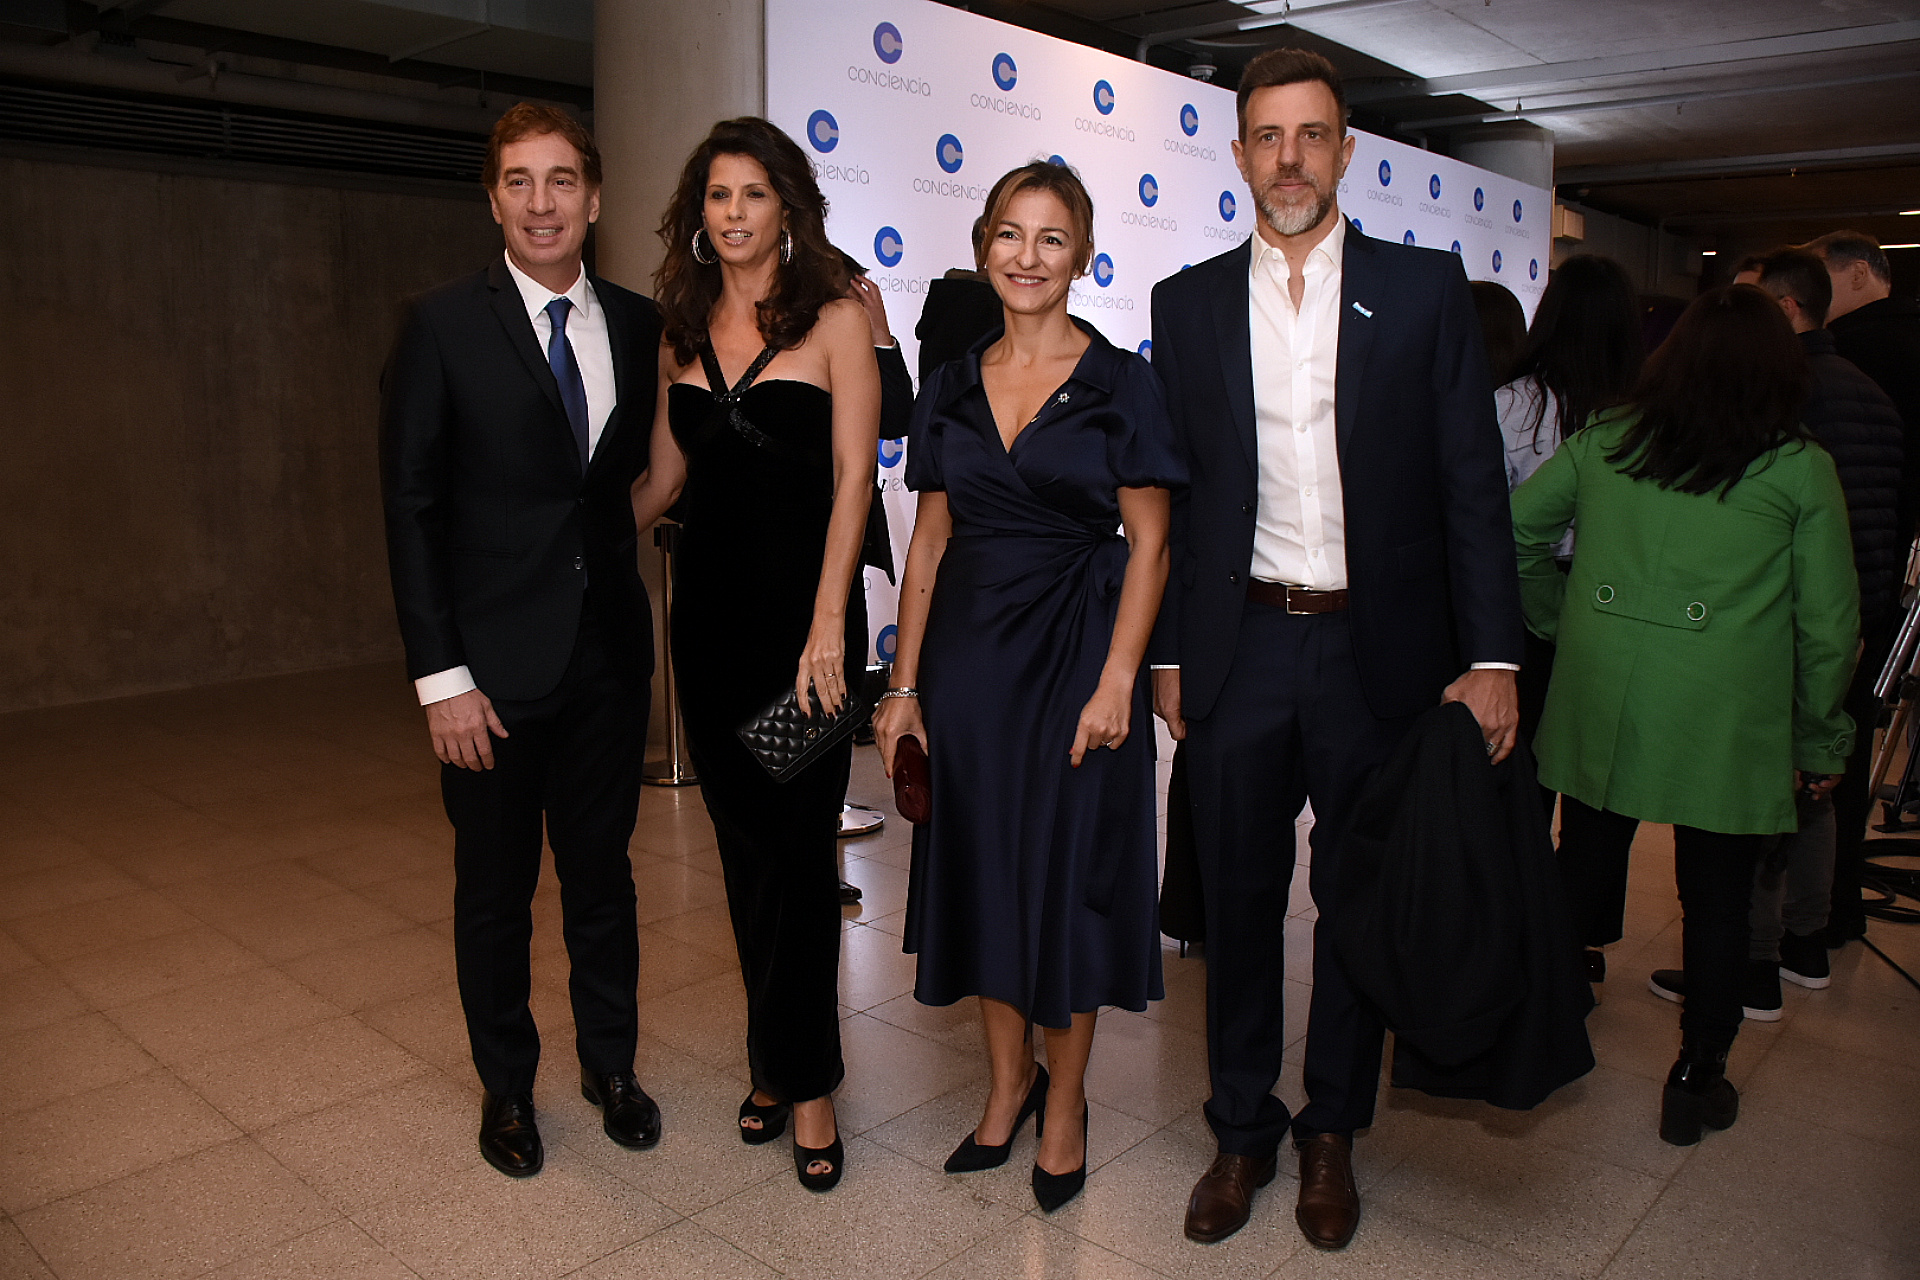 Diego Santilli, Analía Maiorana, Soledad Acuña y Diego Kravetz